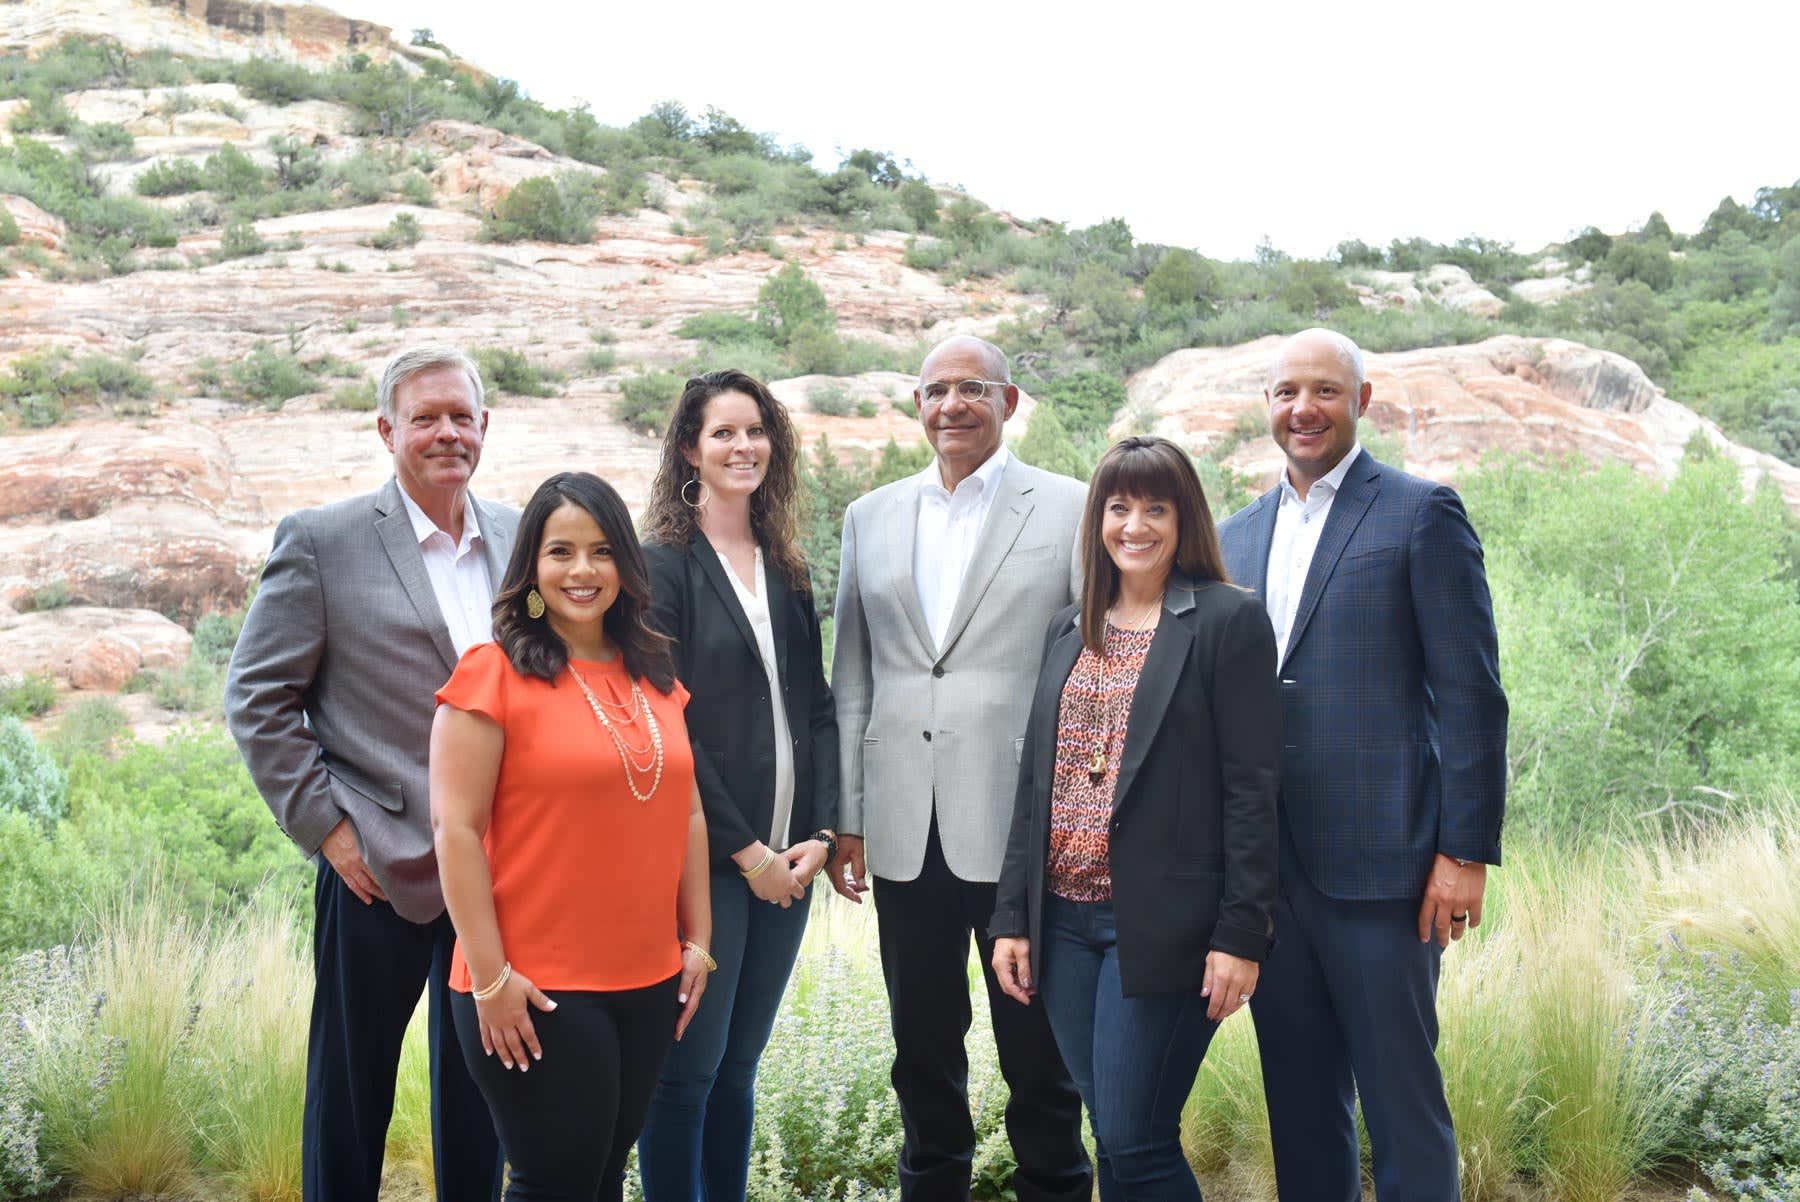 Columbine, Littleton real estate team of experts